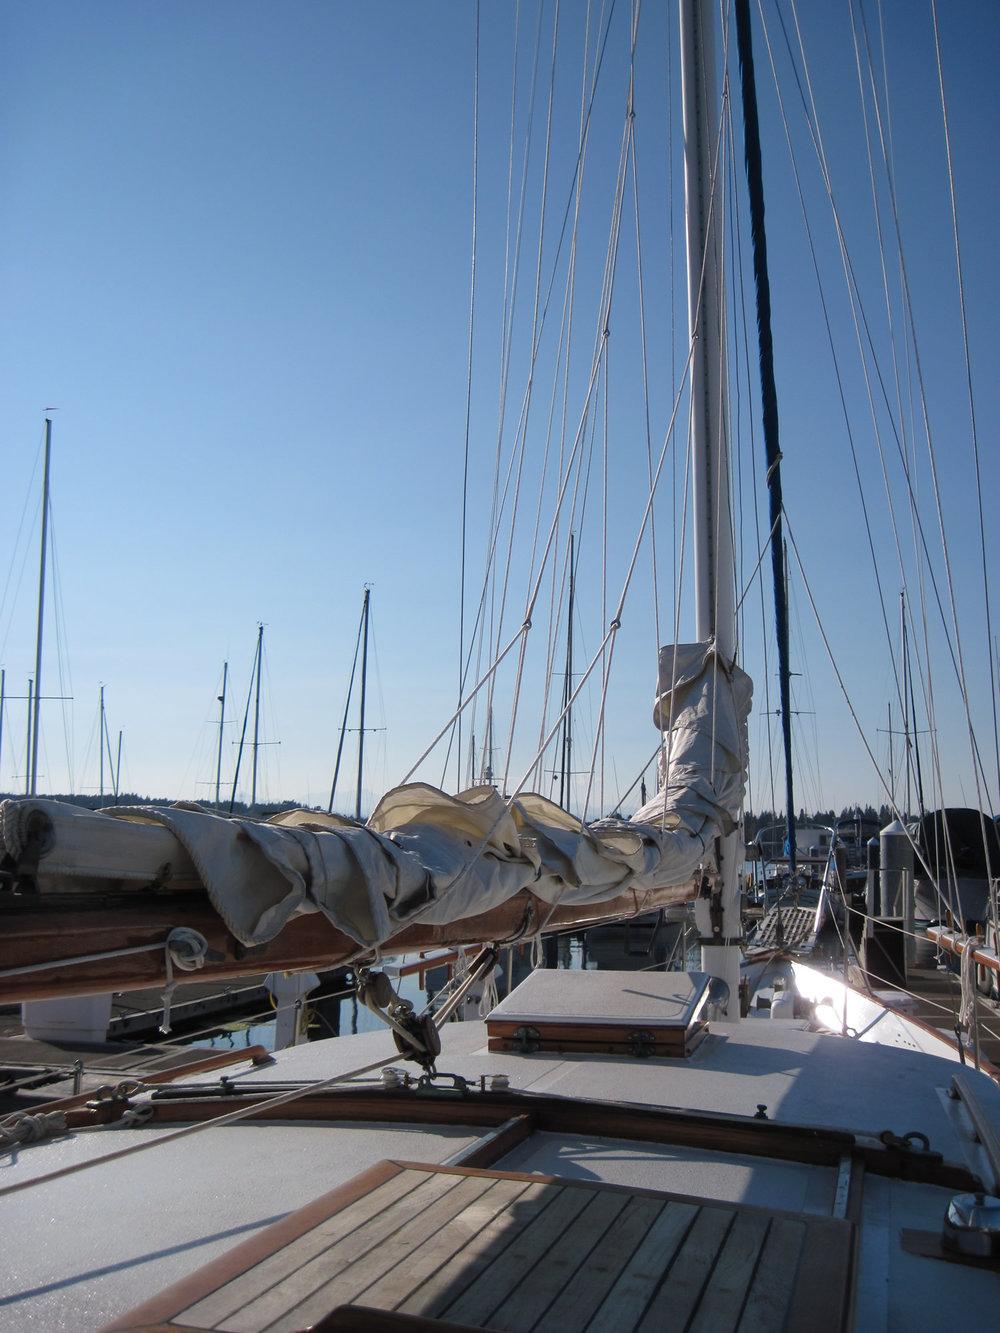 sea-cloud-yacht restoration-after-sails.jpg